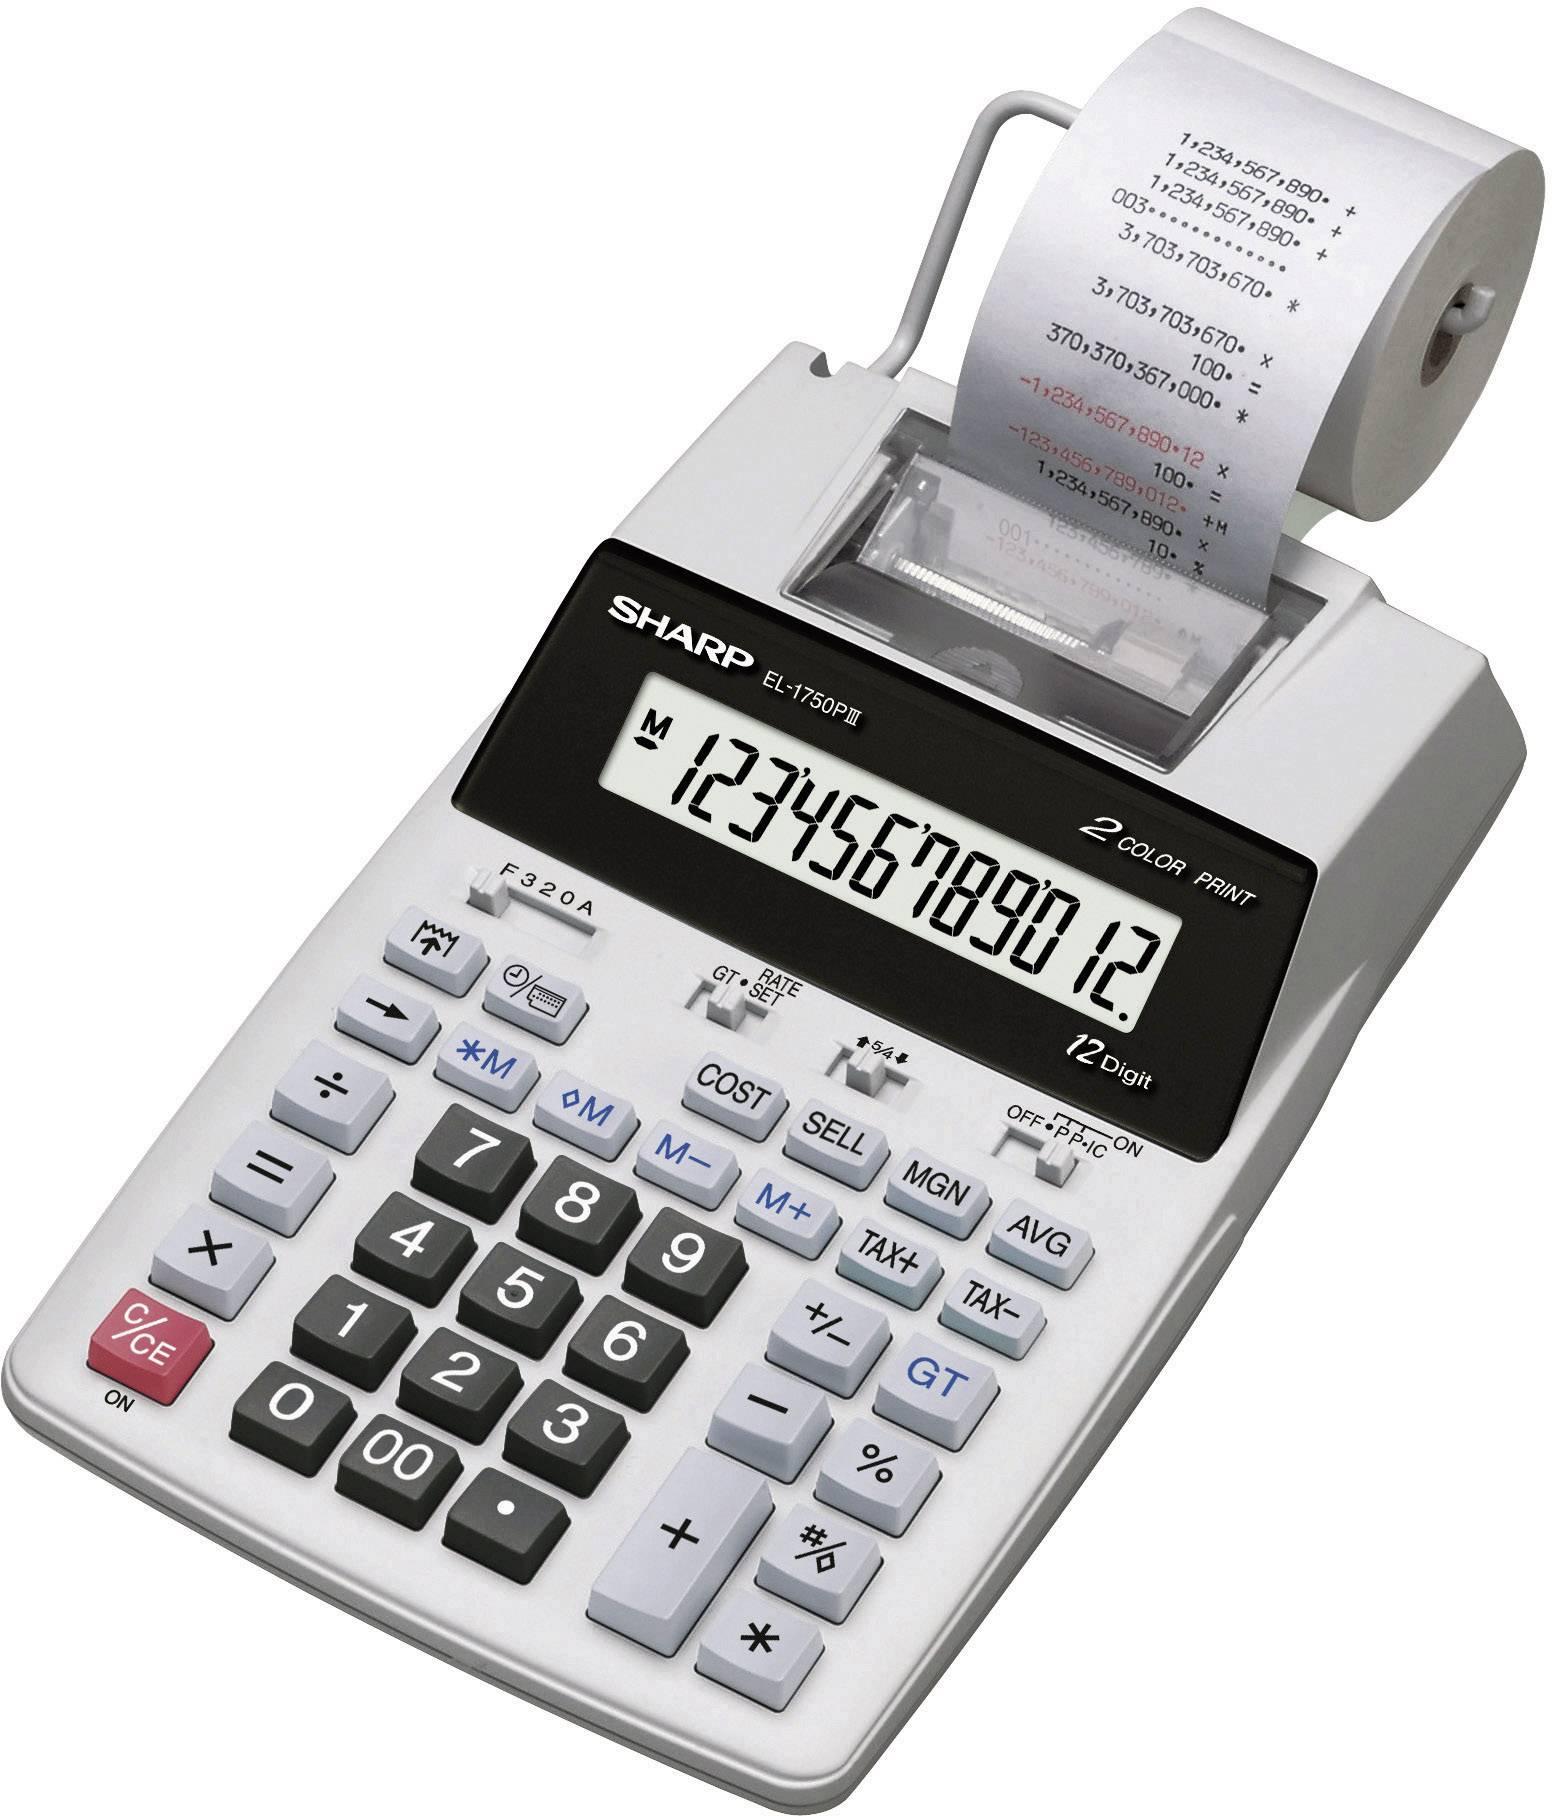 Kalkulačky a pokladny